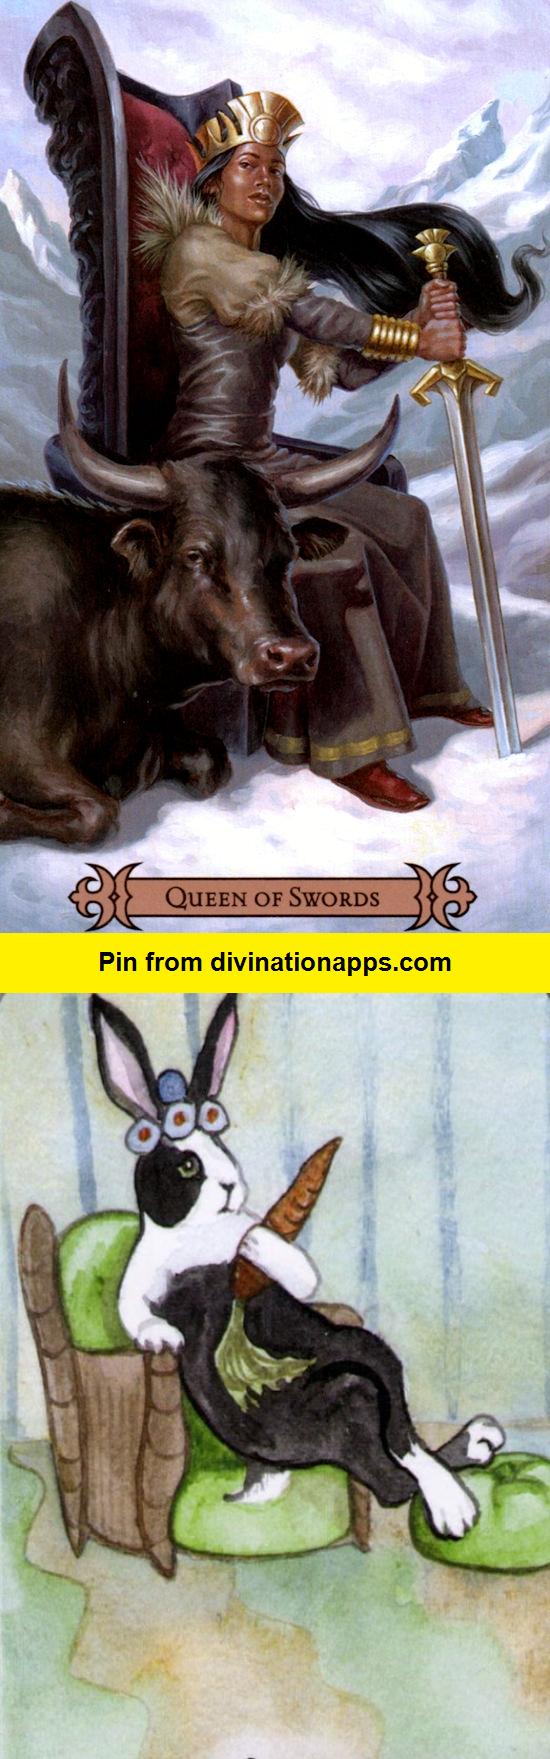 Best Tarot Decks 2020 Queen of Swords: sharp witted woman and cruel (reverse